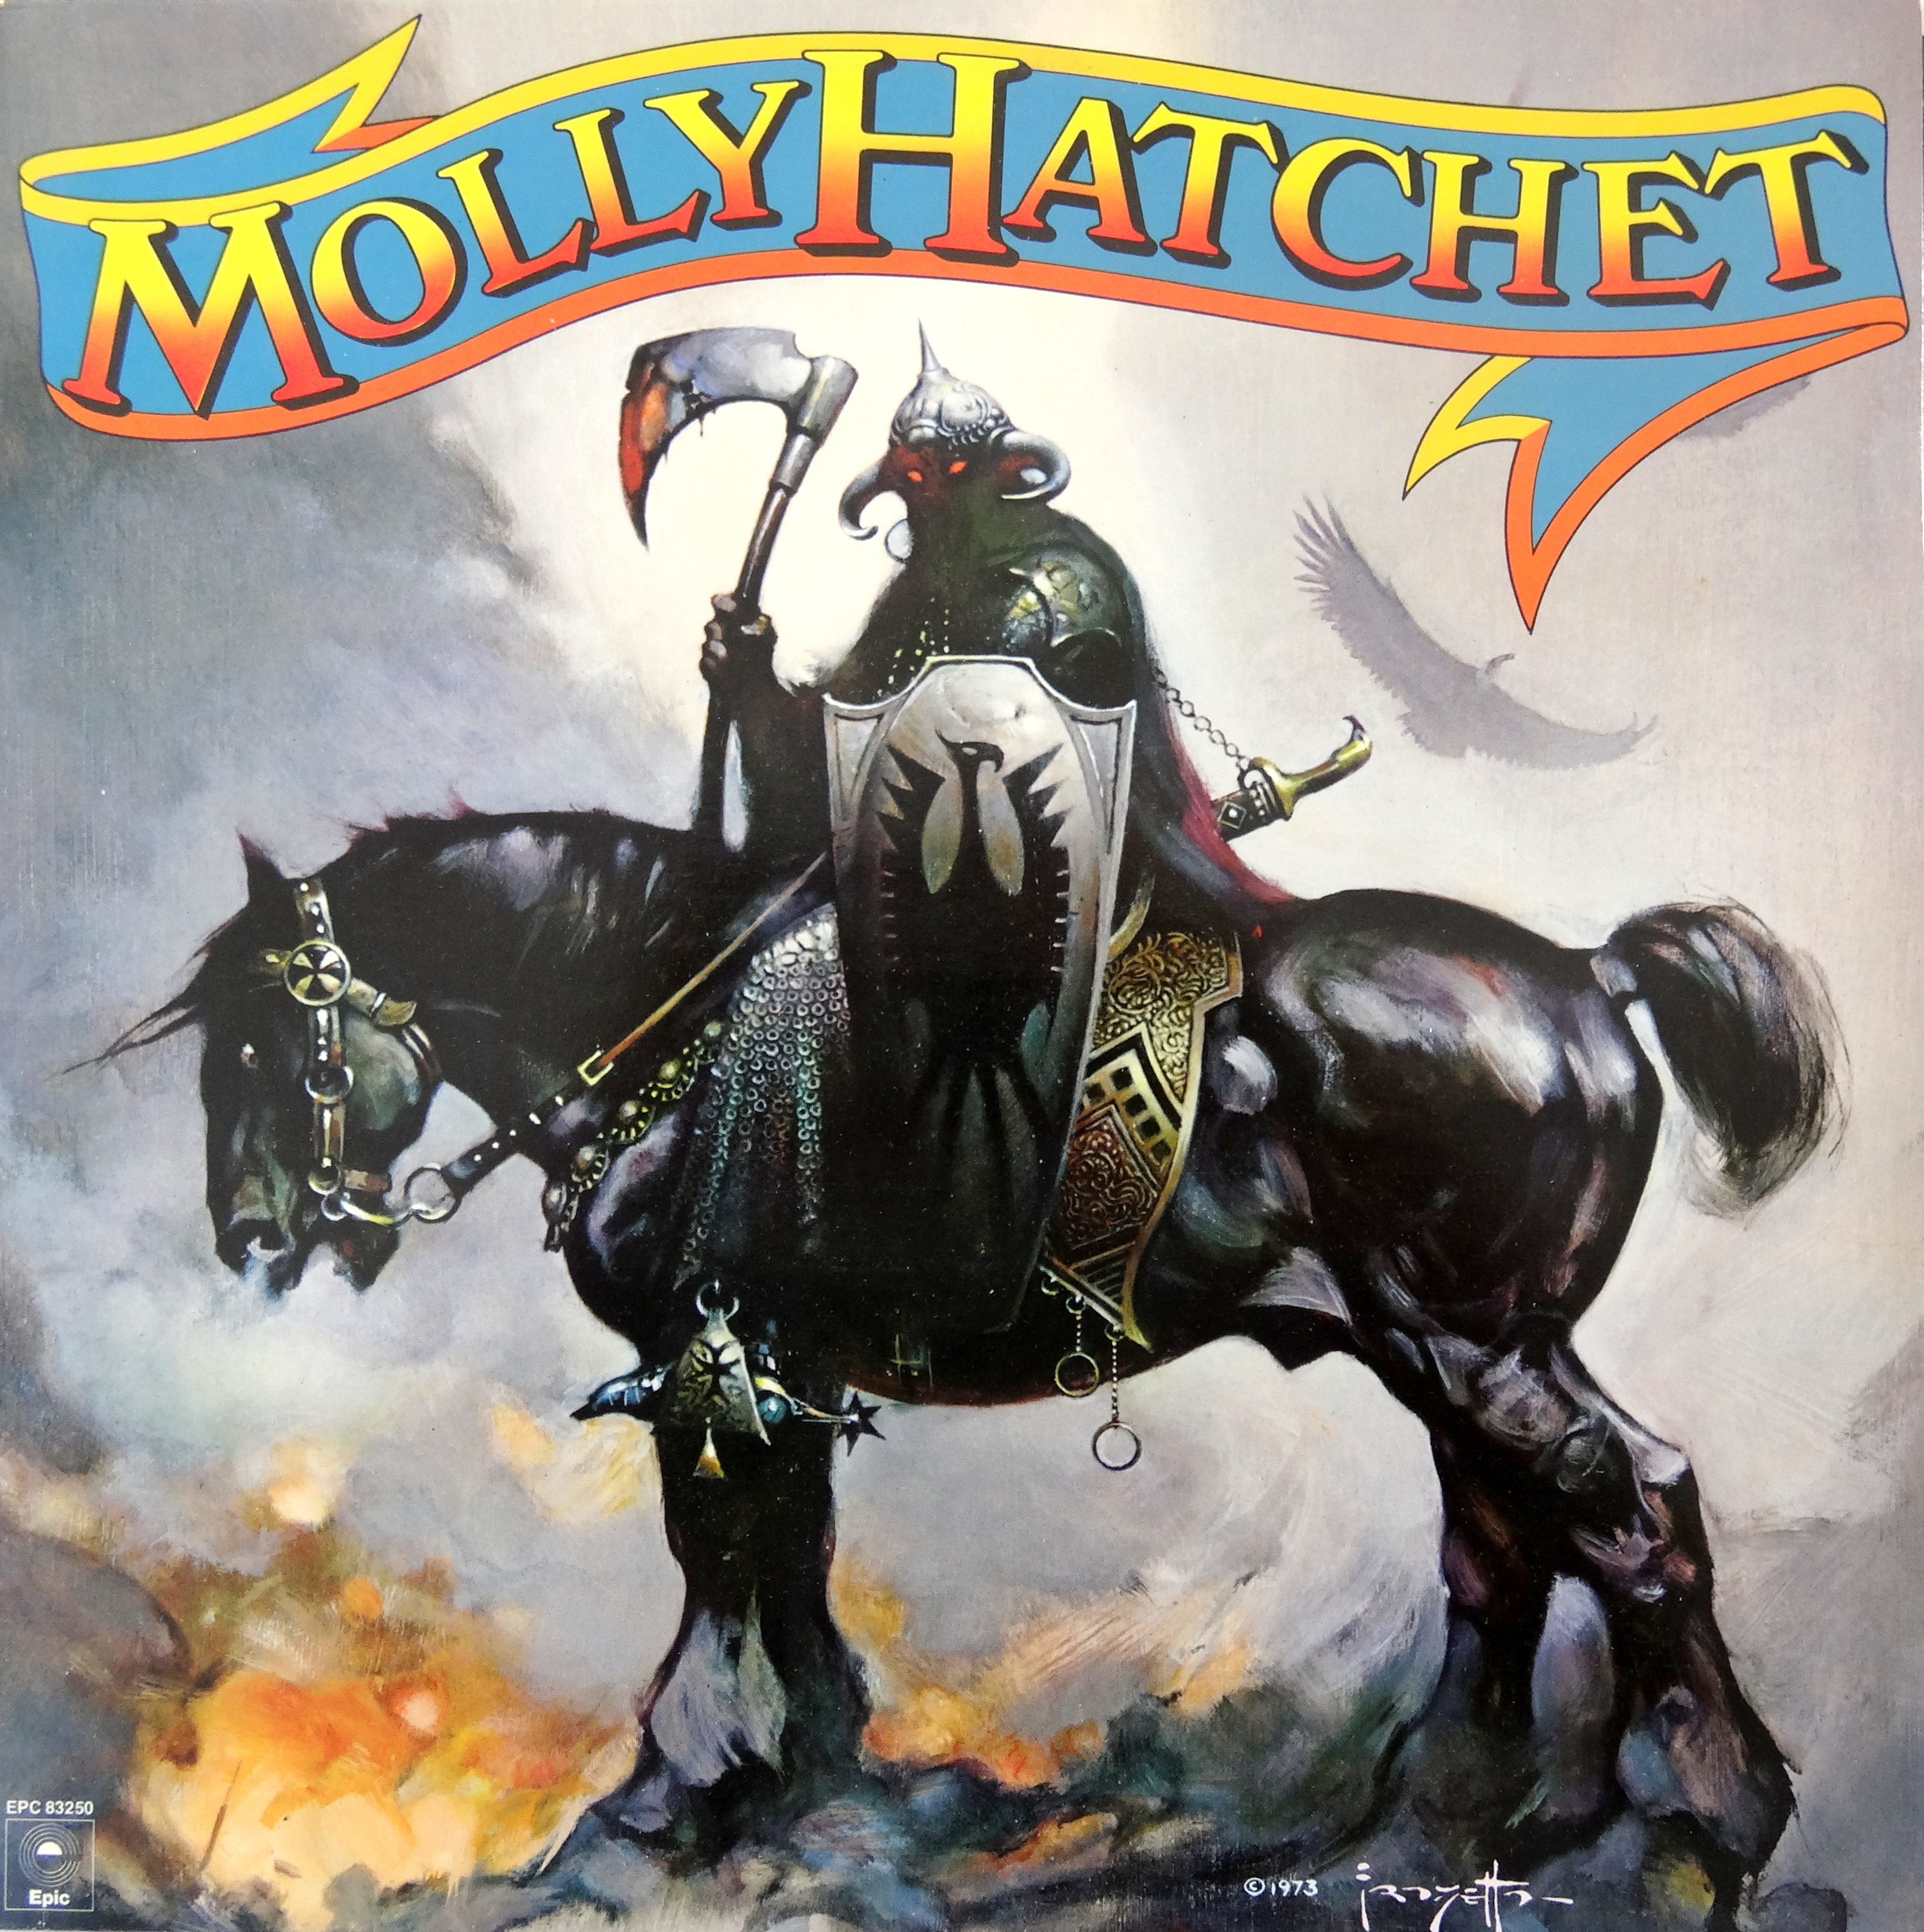 flirting with disaster molly hatchet album cute songs youtube full